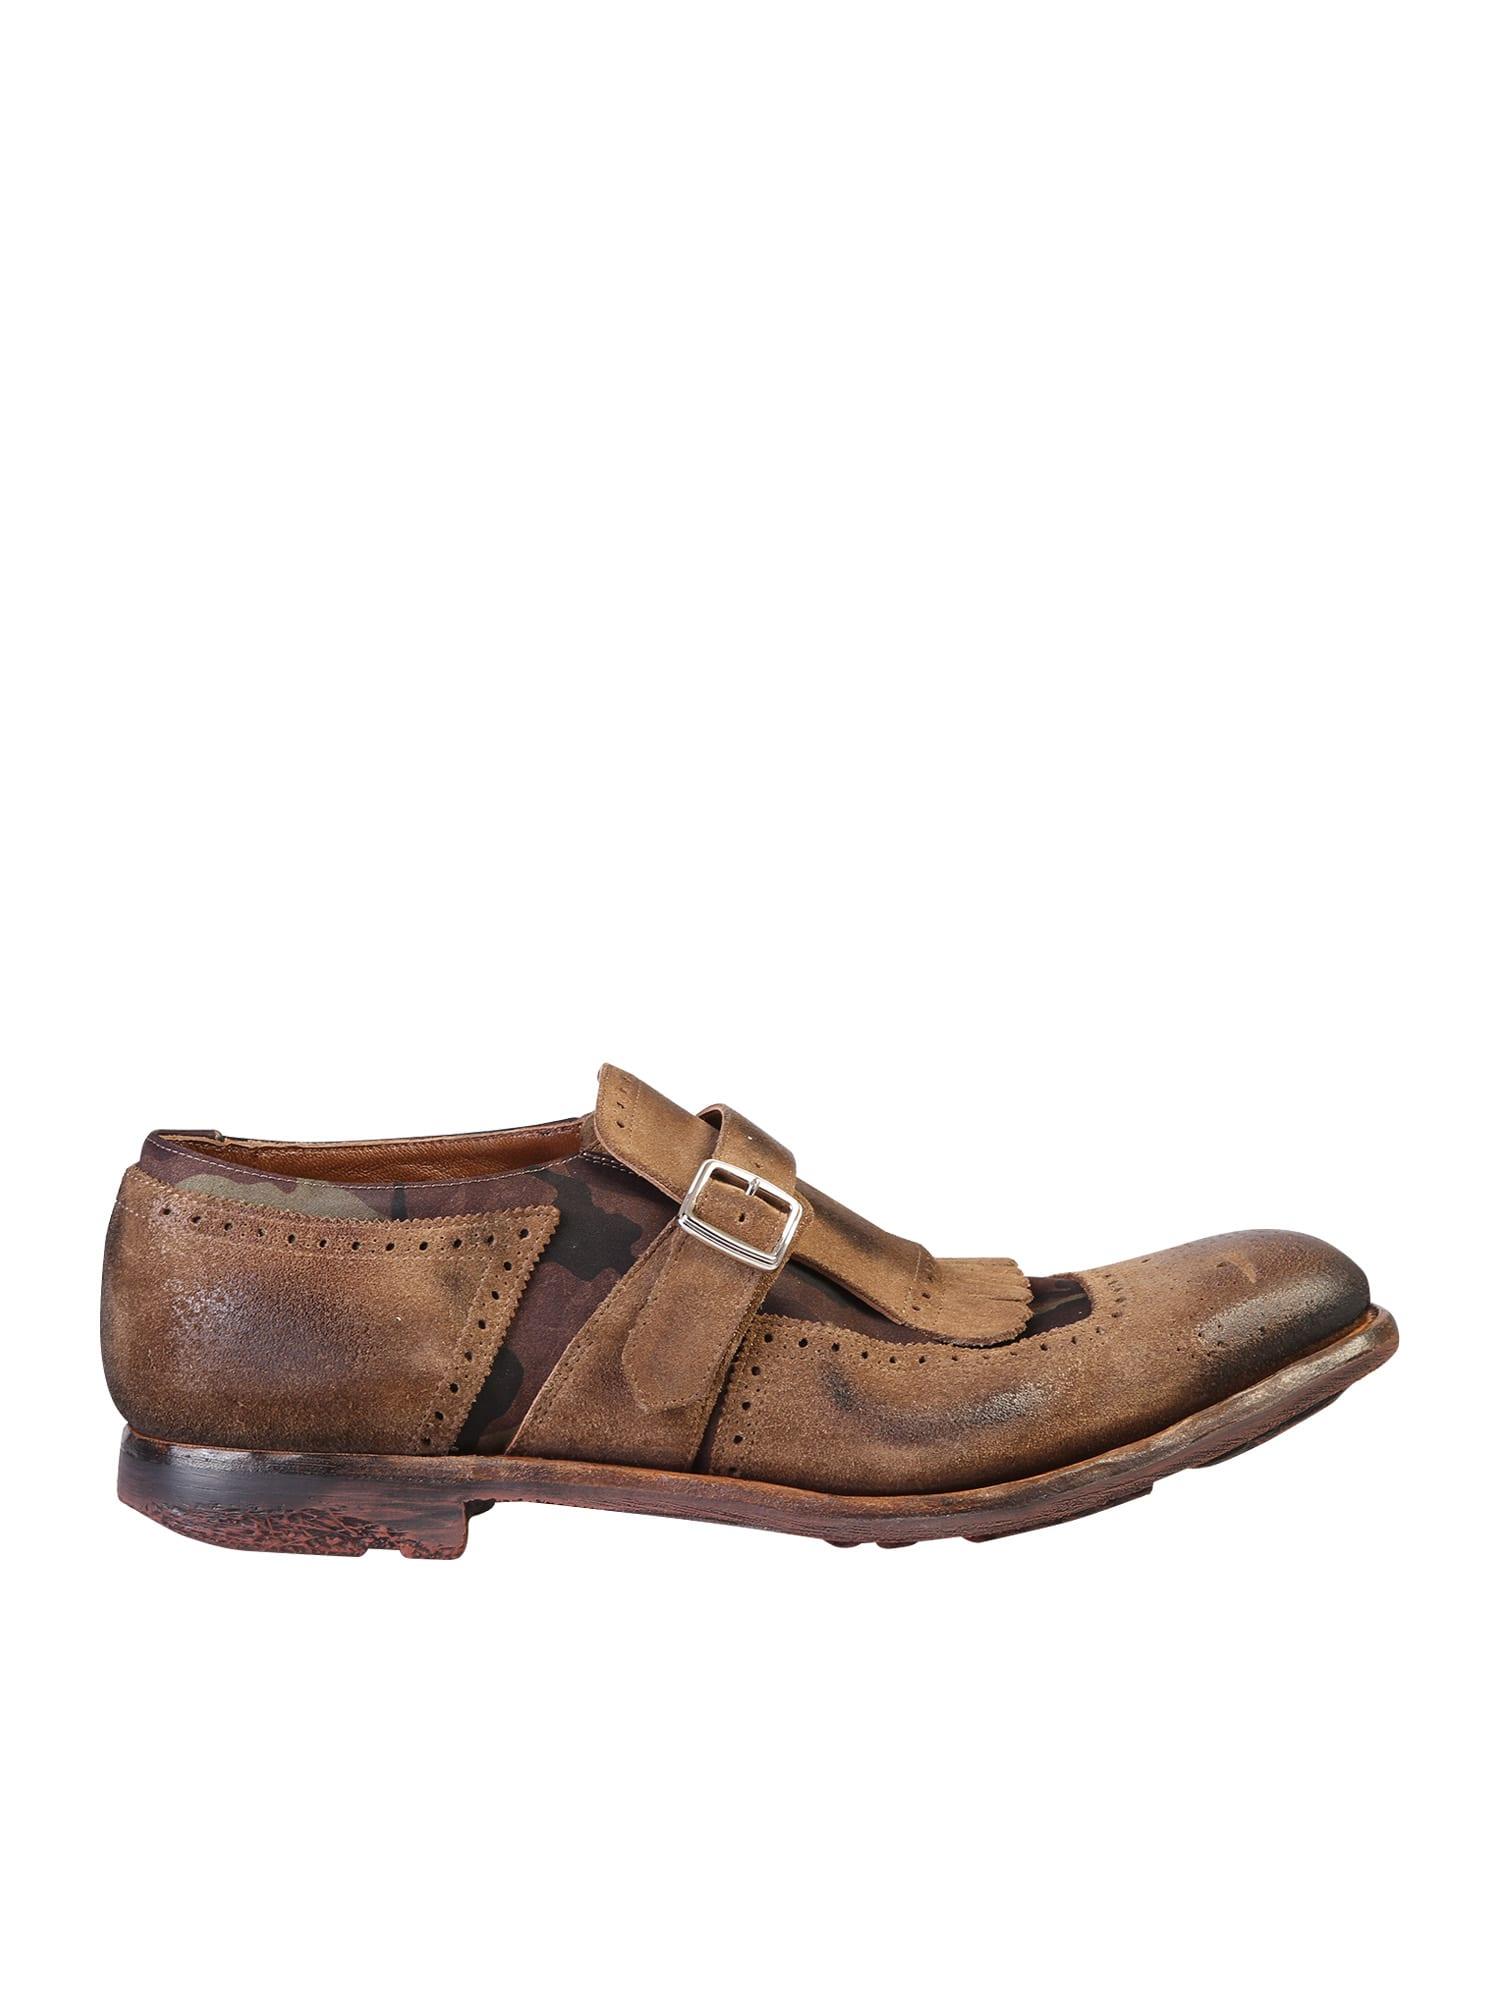 Shanghai Shoes